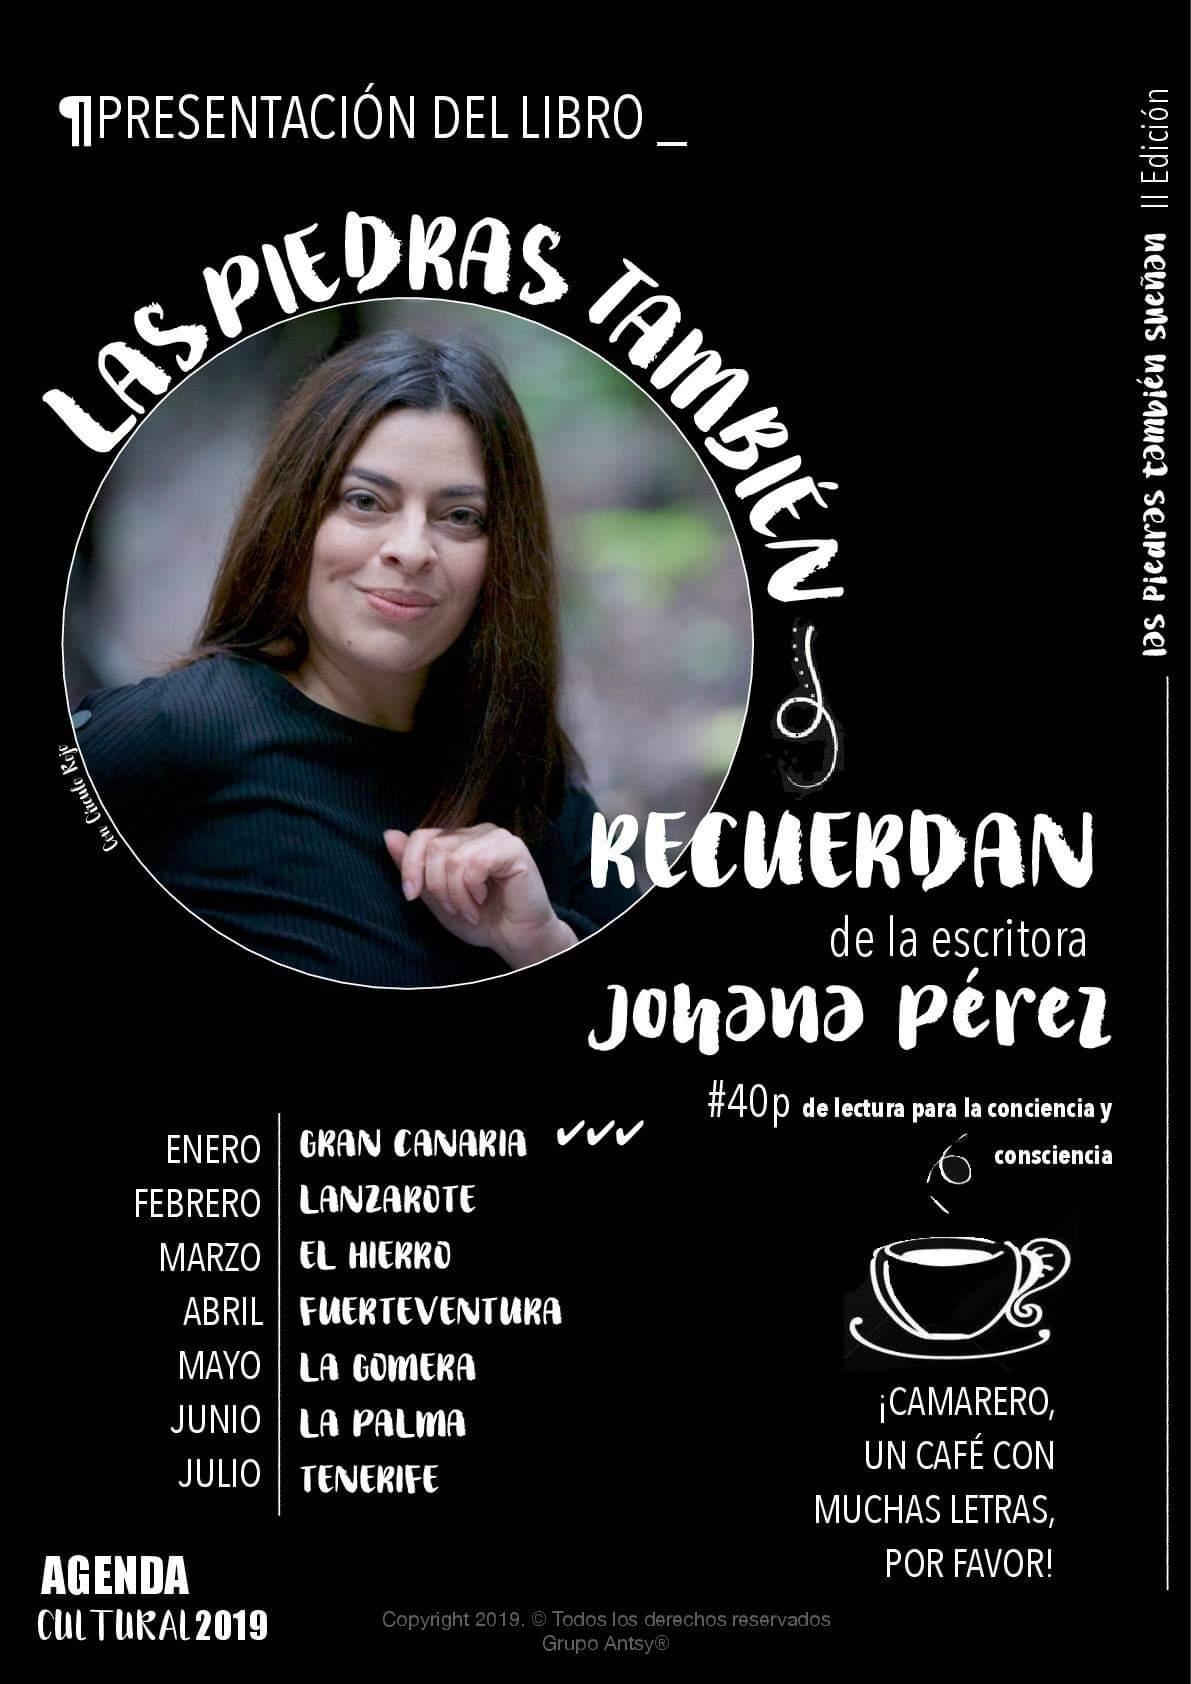 Johana Pérez